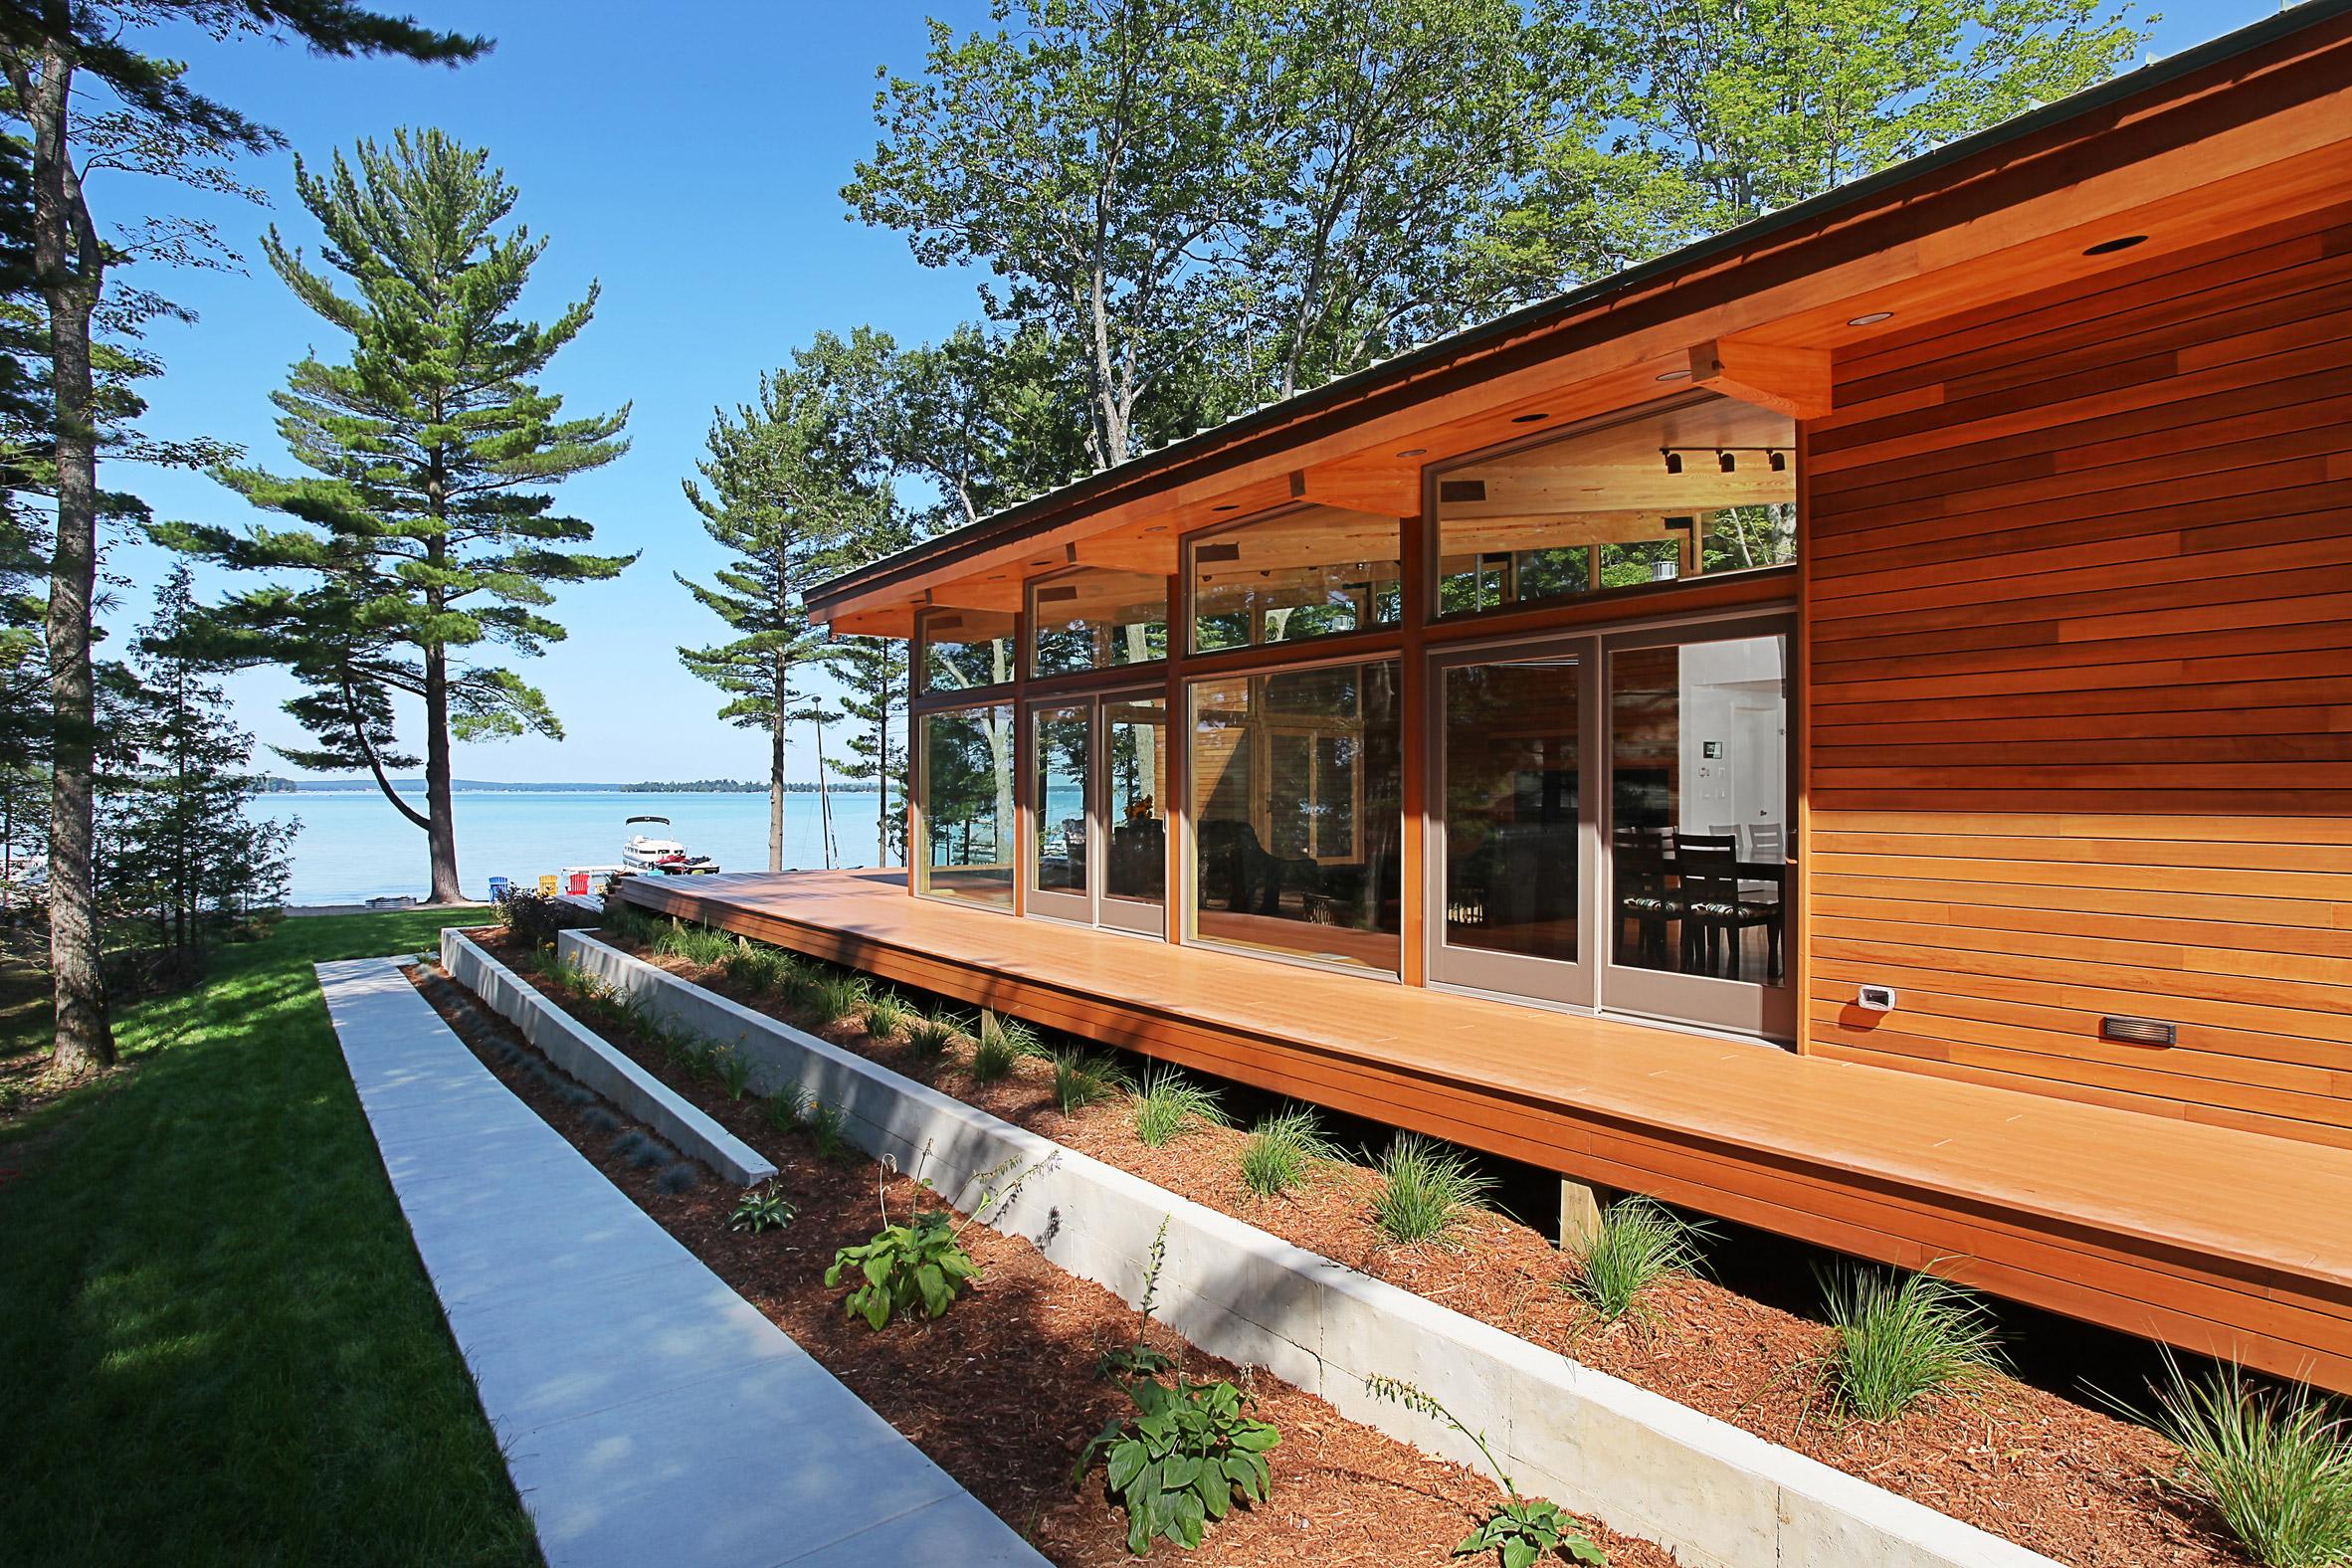 Higgins Lake House by Jeff Jordan Architects